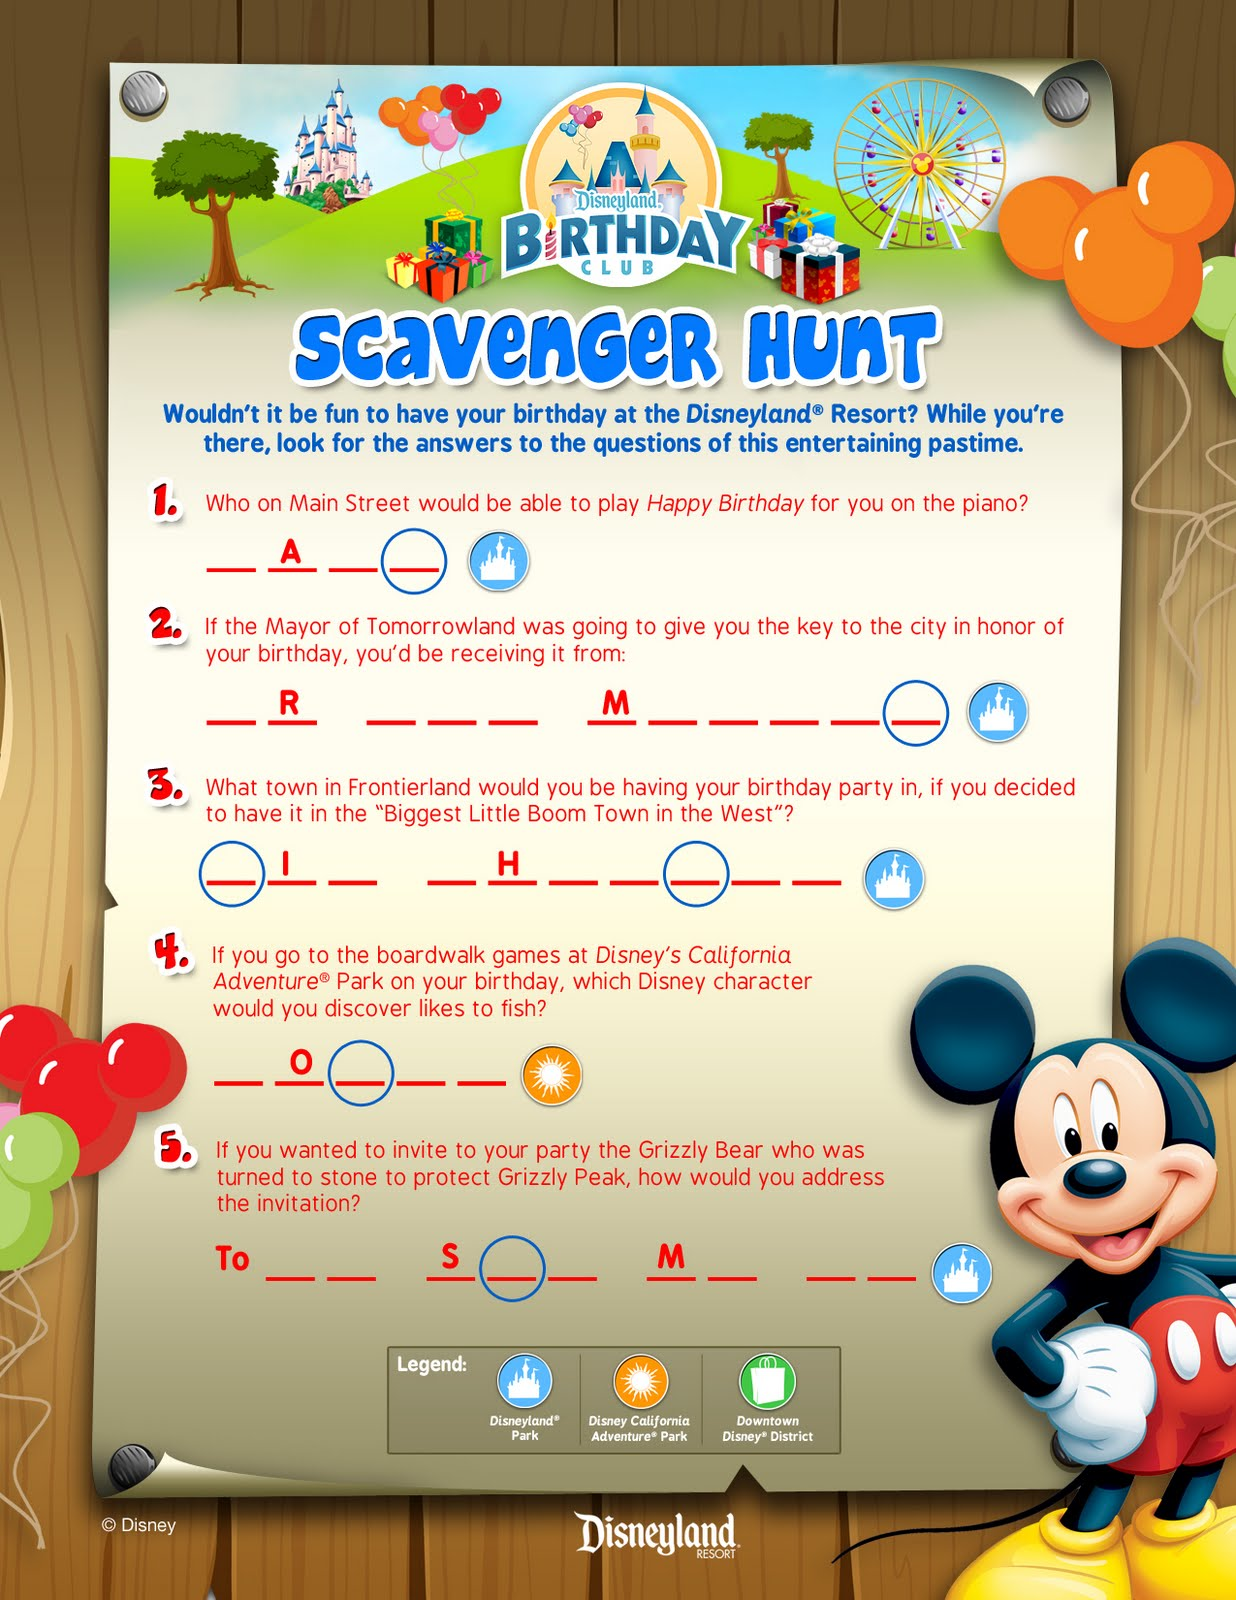 Mouse House Musings Disneyland S Birthday Club Scavenger